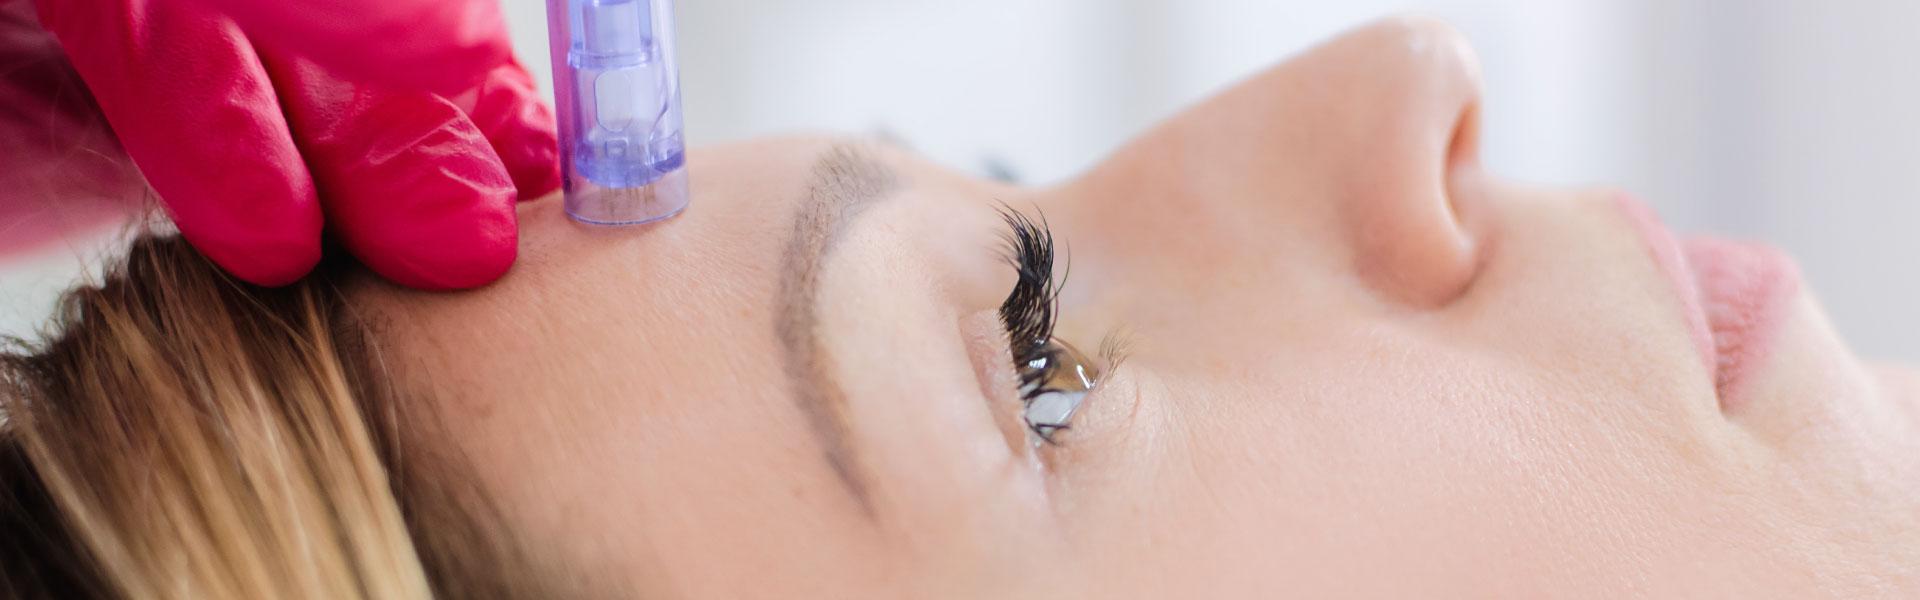 Cheshire Aesthetic Clinic | IPL Dermapen Skin Care | Dermapen